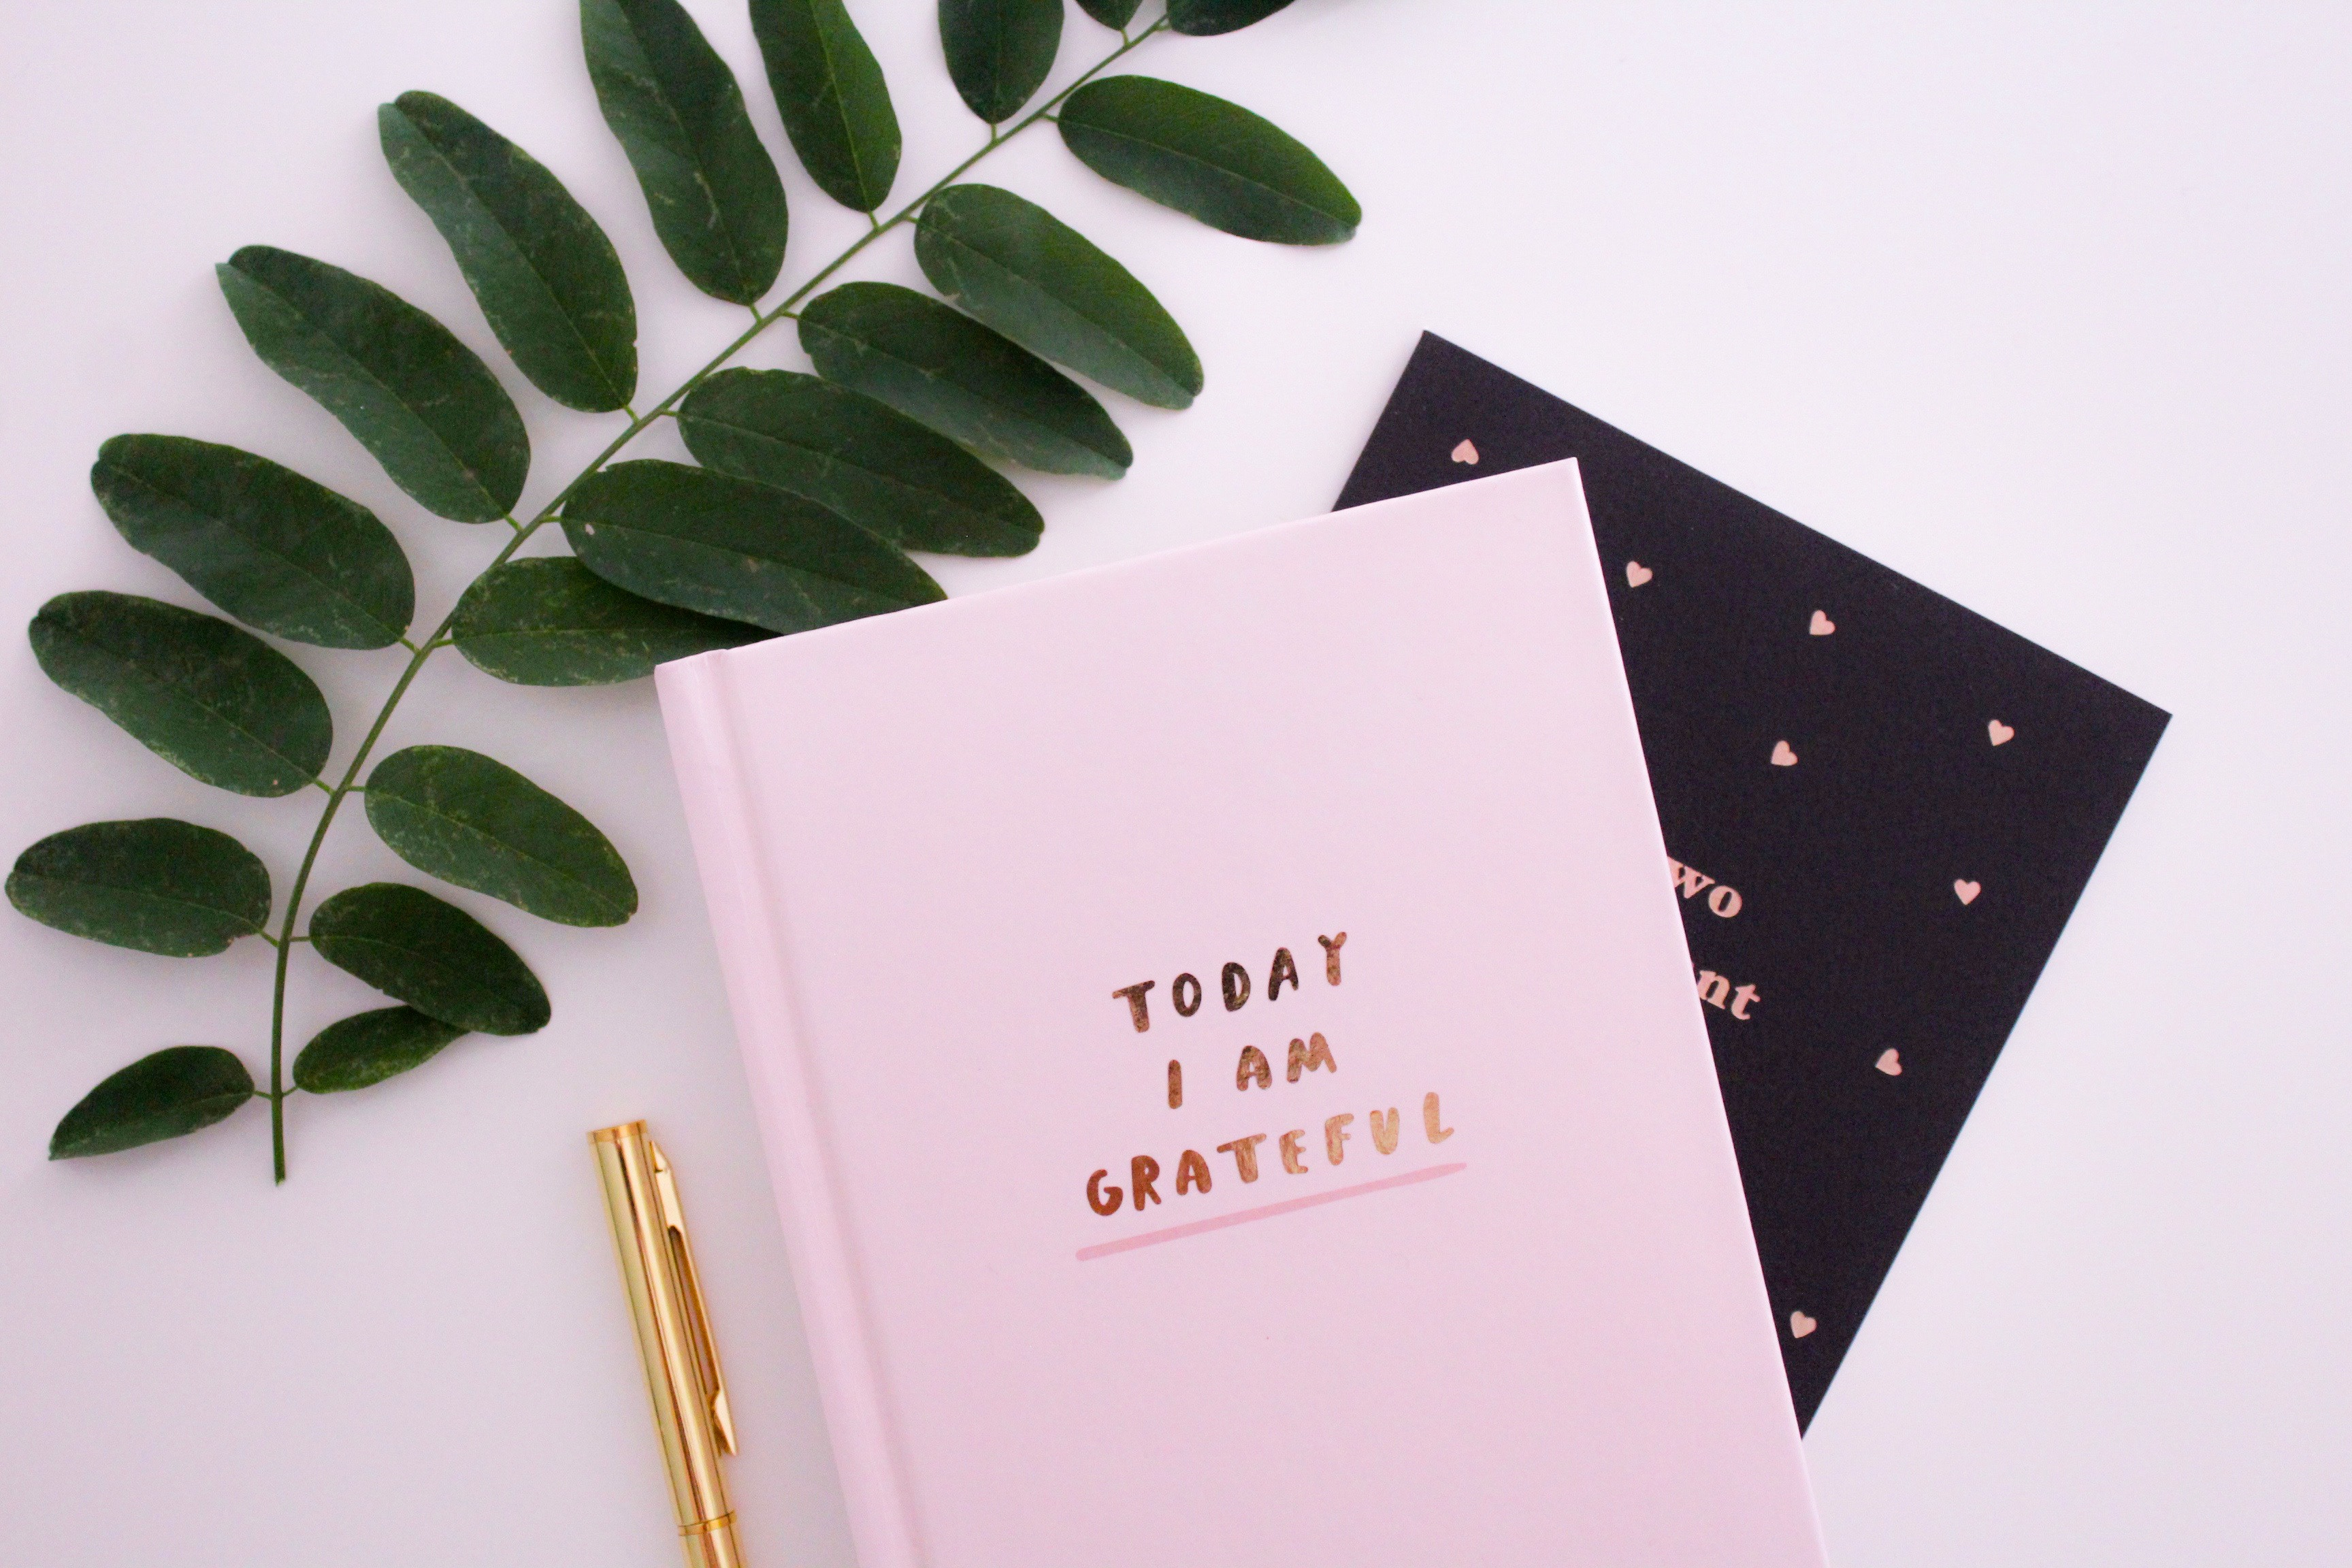 Gratitude: Practice and Benefits